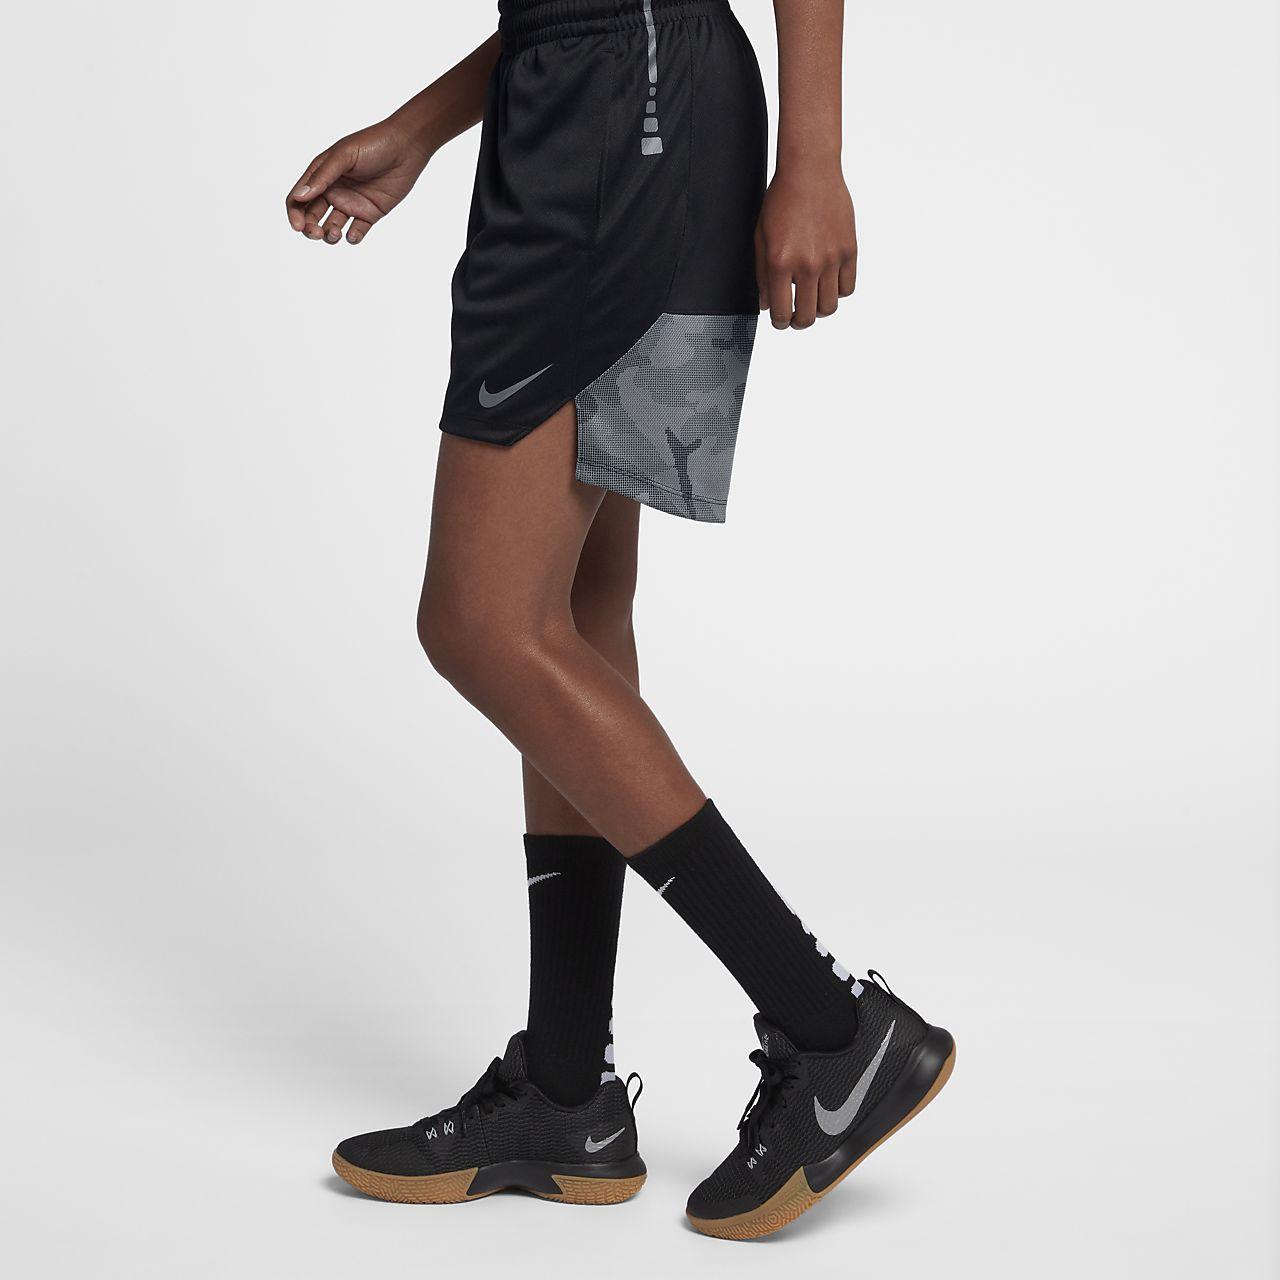 Nike Elite Women's Knit Basketball Shorts